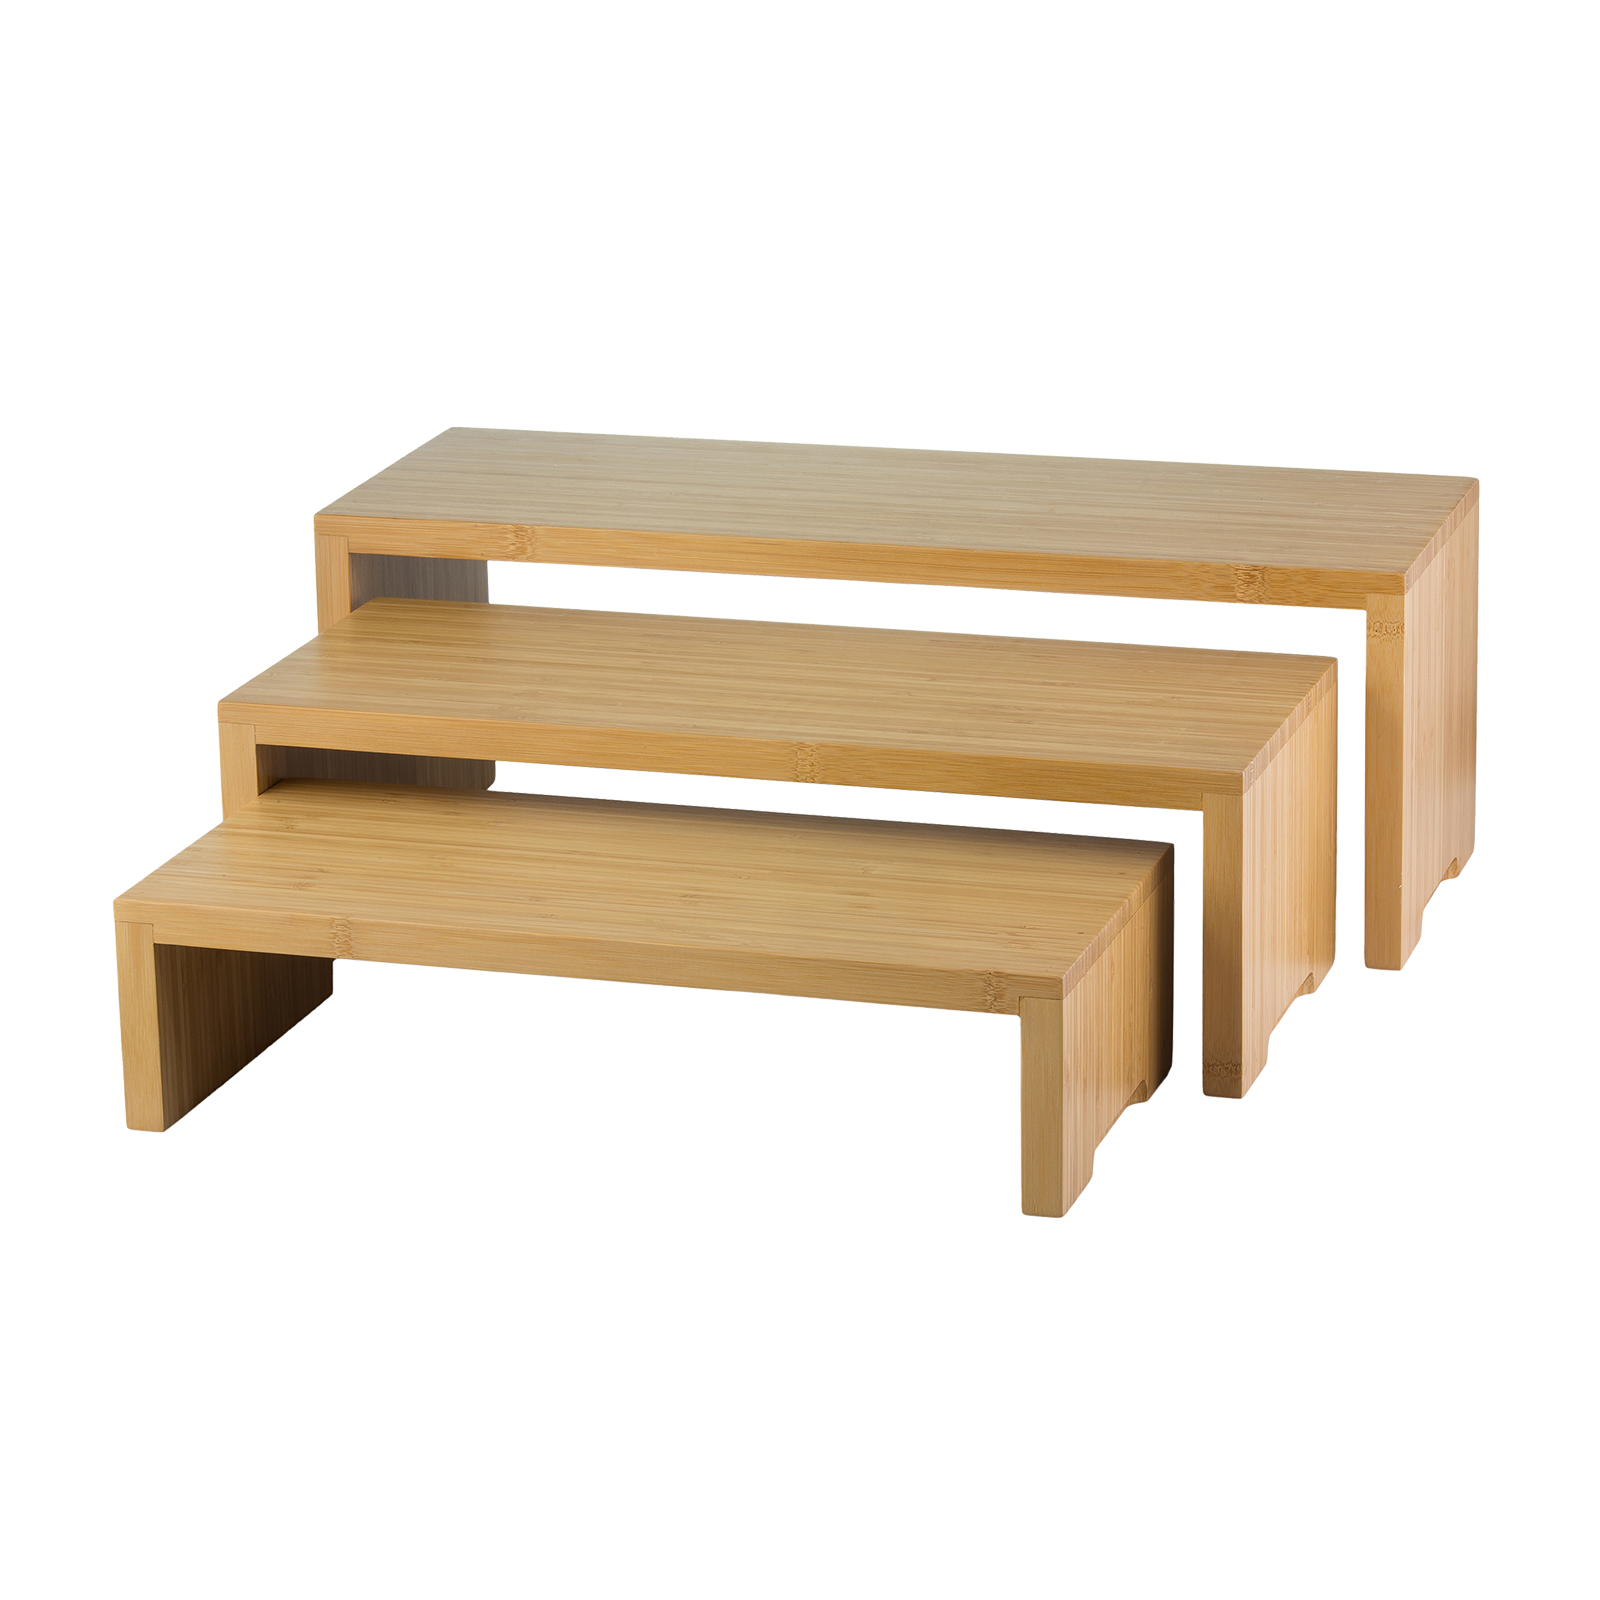 TableCraft Products RBAM300 display riser, set